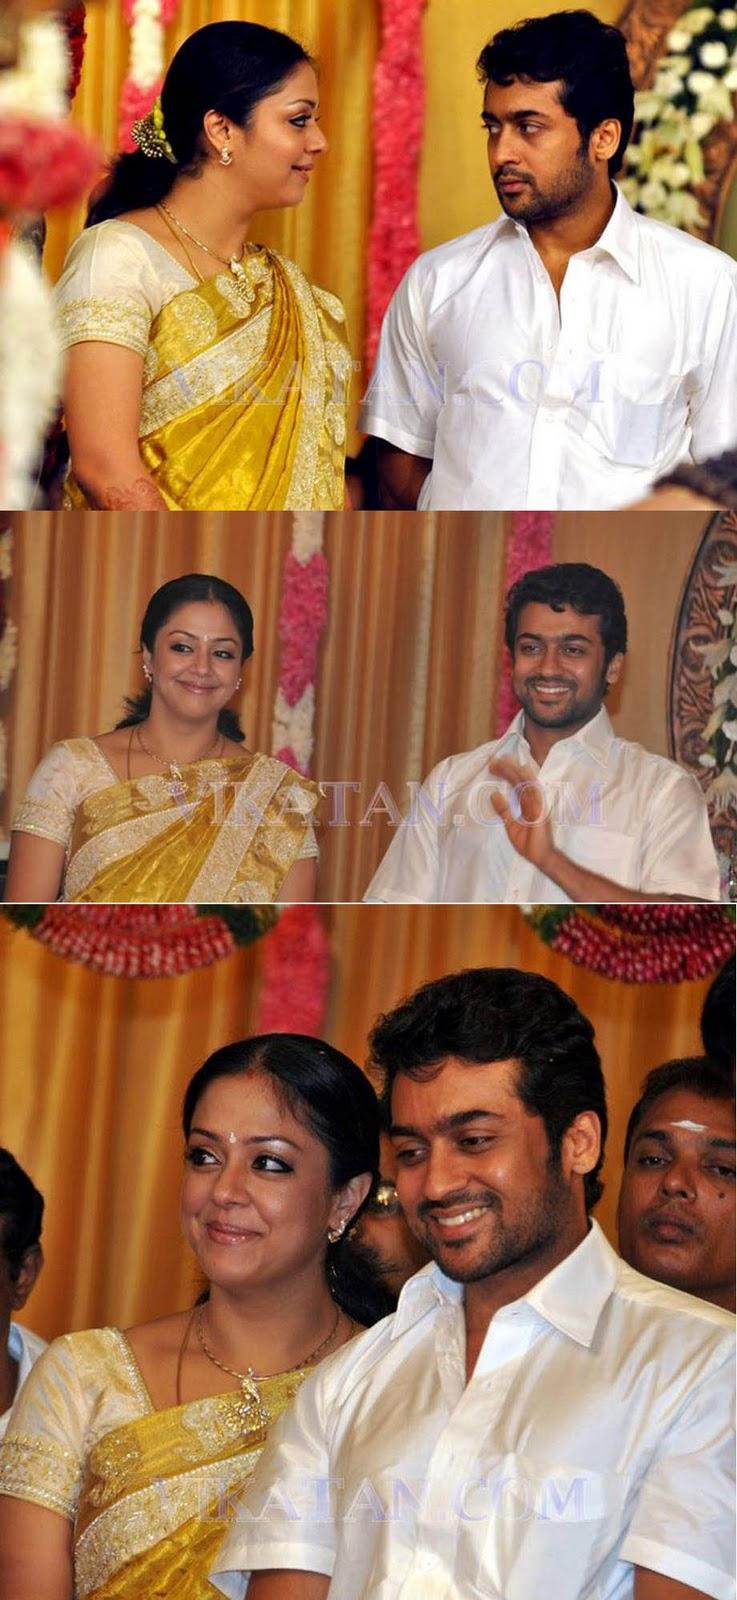 Tamil actor vivek wedding photos KUTHOOSI - PHOTOS - Tamil Nadu News